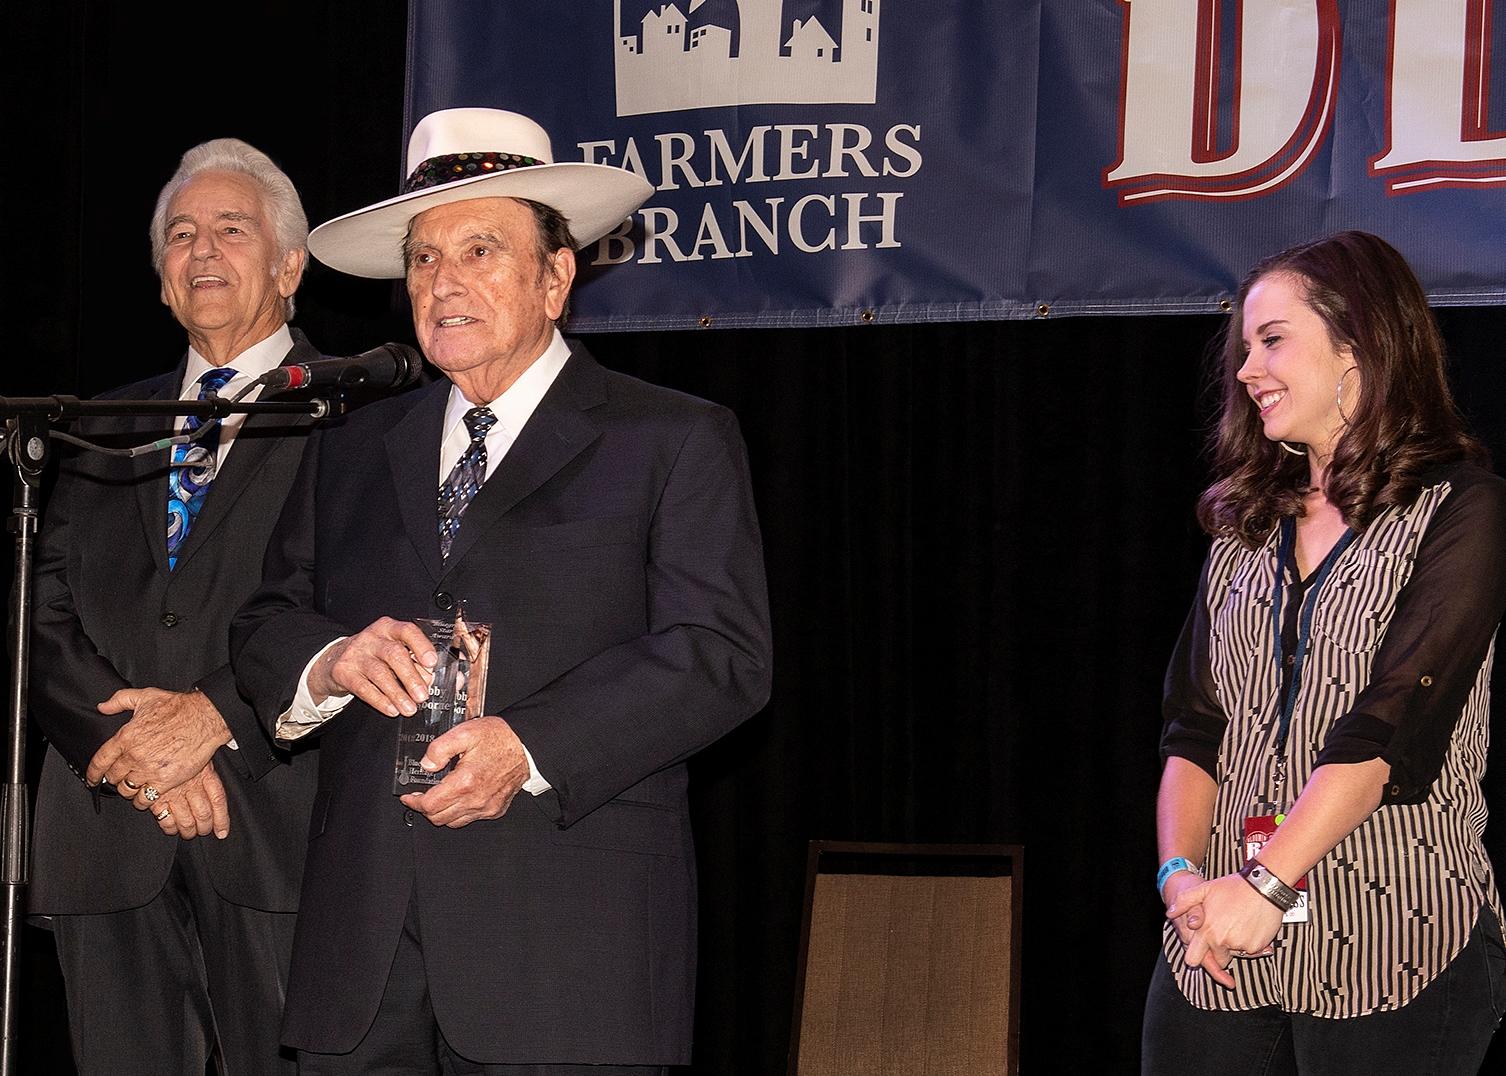 Bobby Osborne Star Award presentation  (photo by Perry Callahan)